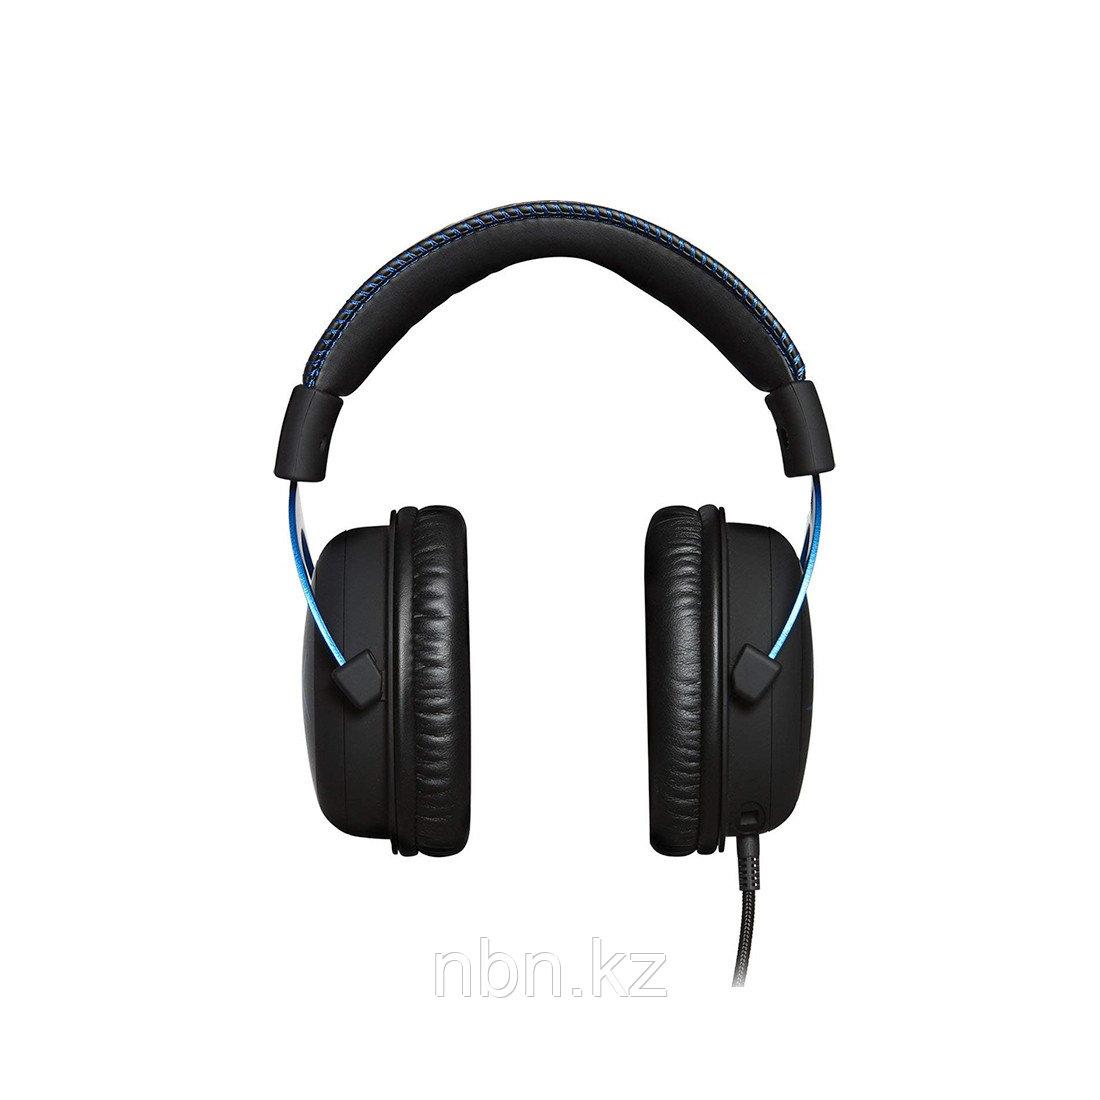 Наушники HyperX Cloud Gaming Headset - Blue for PS4 HX-HSCLS-BL/EM